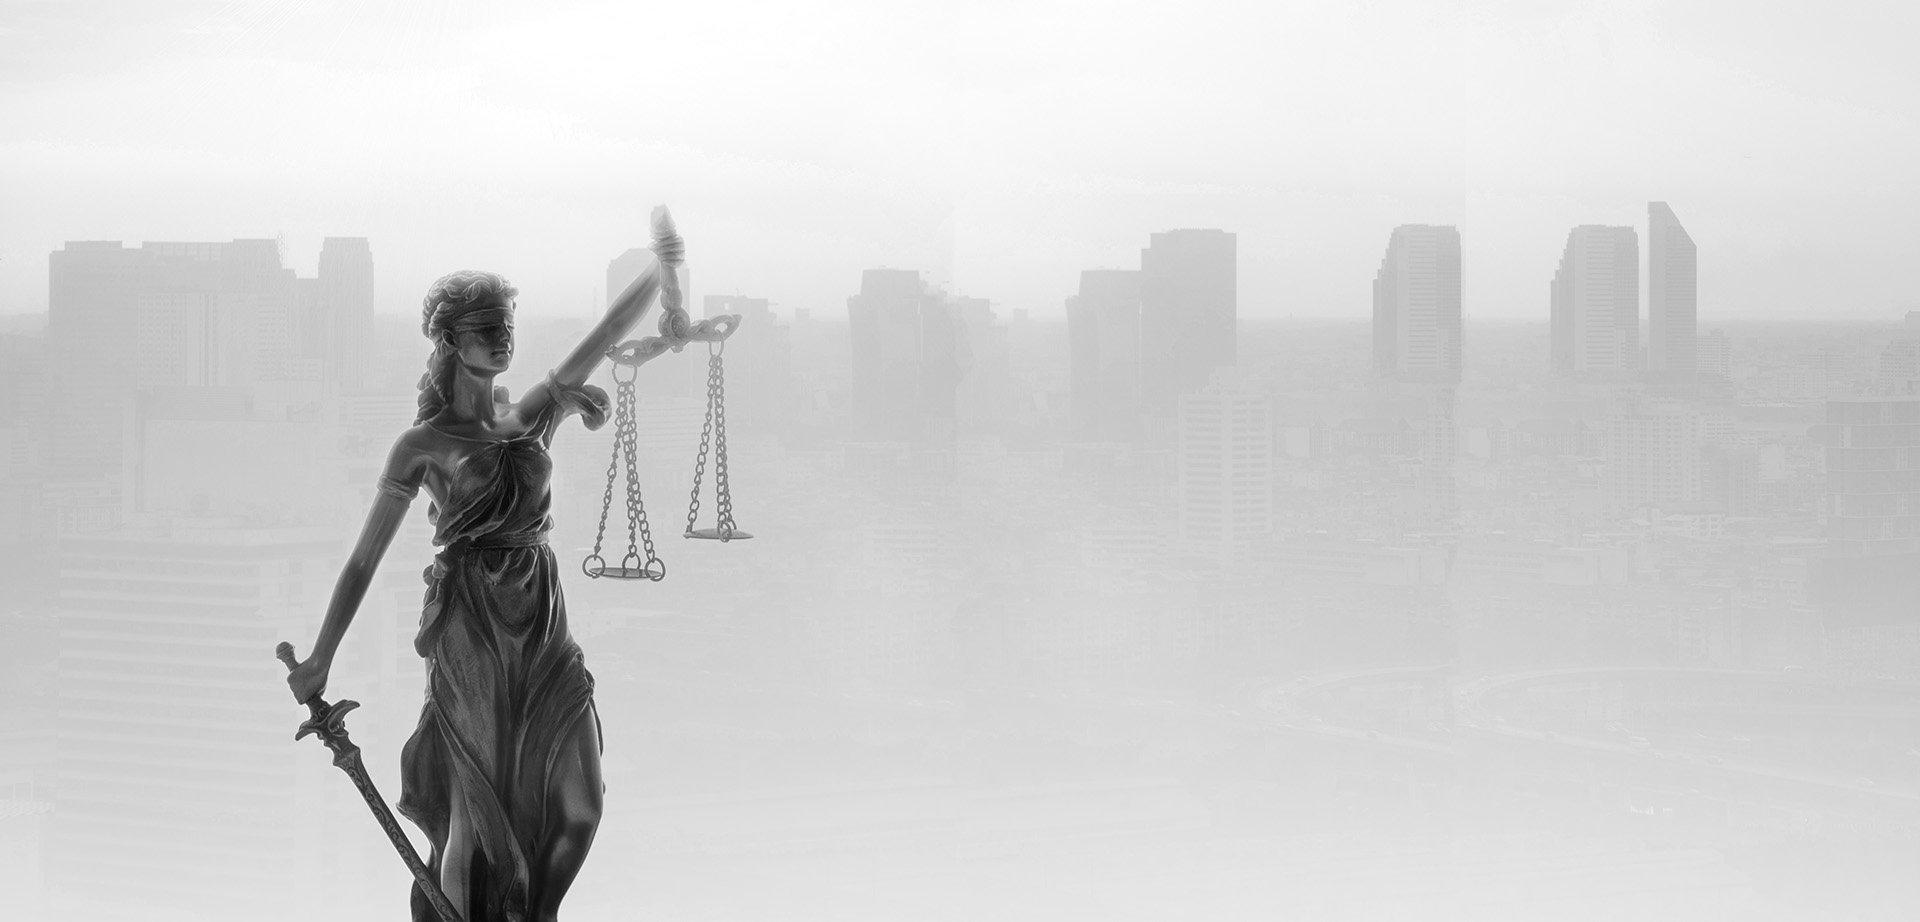 Verhaeghe Law Office Lawyers